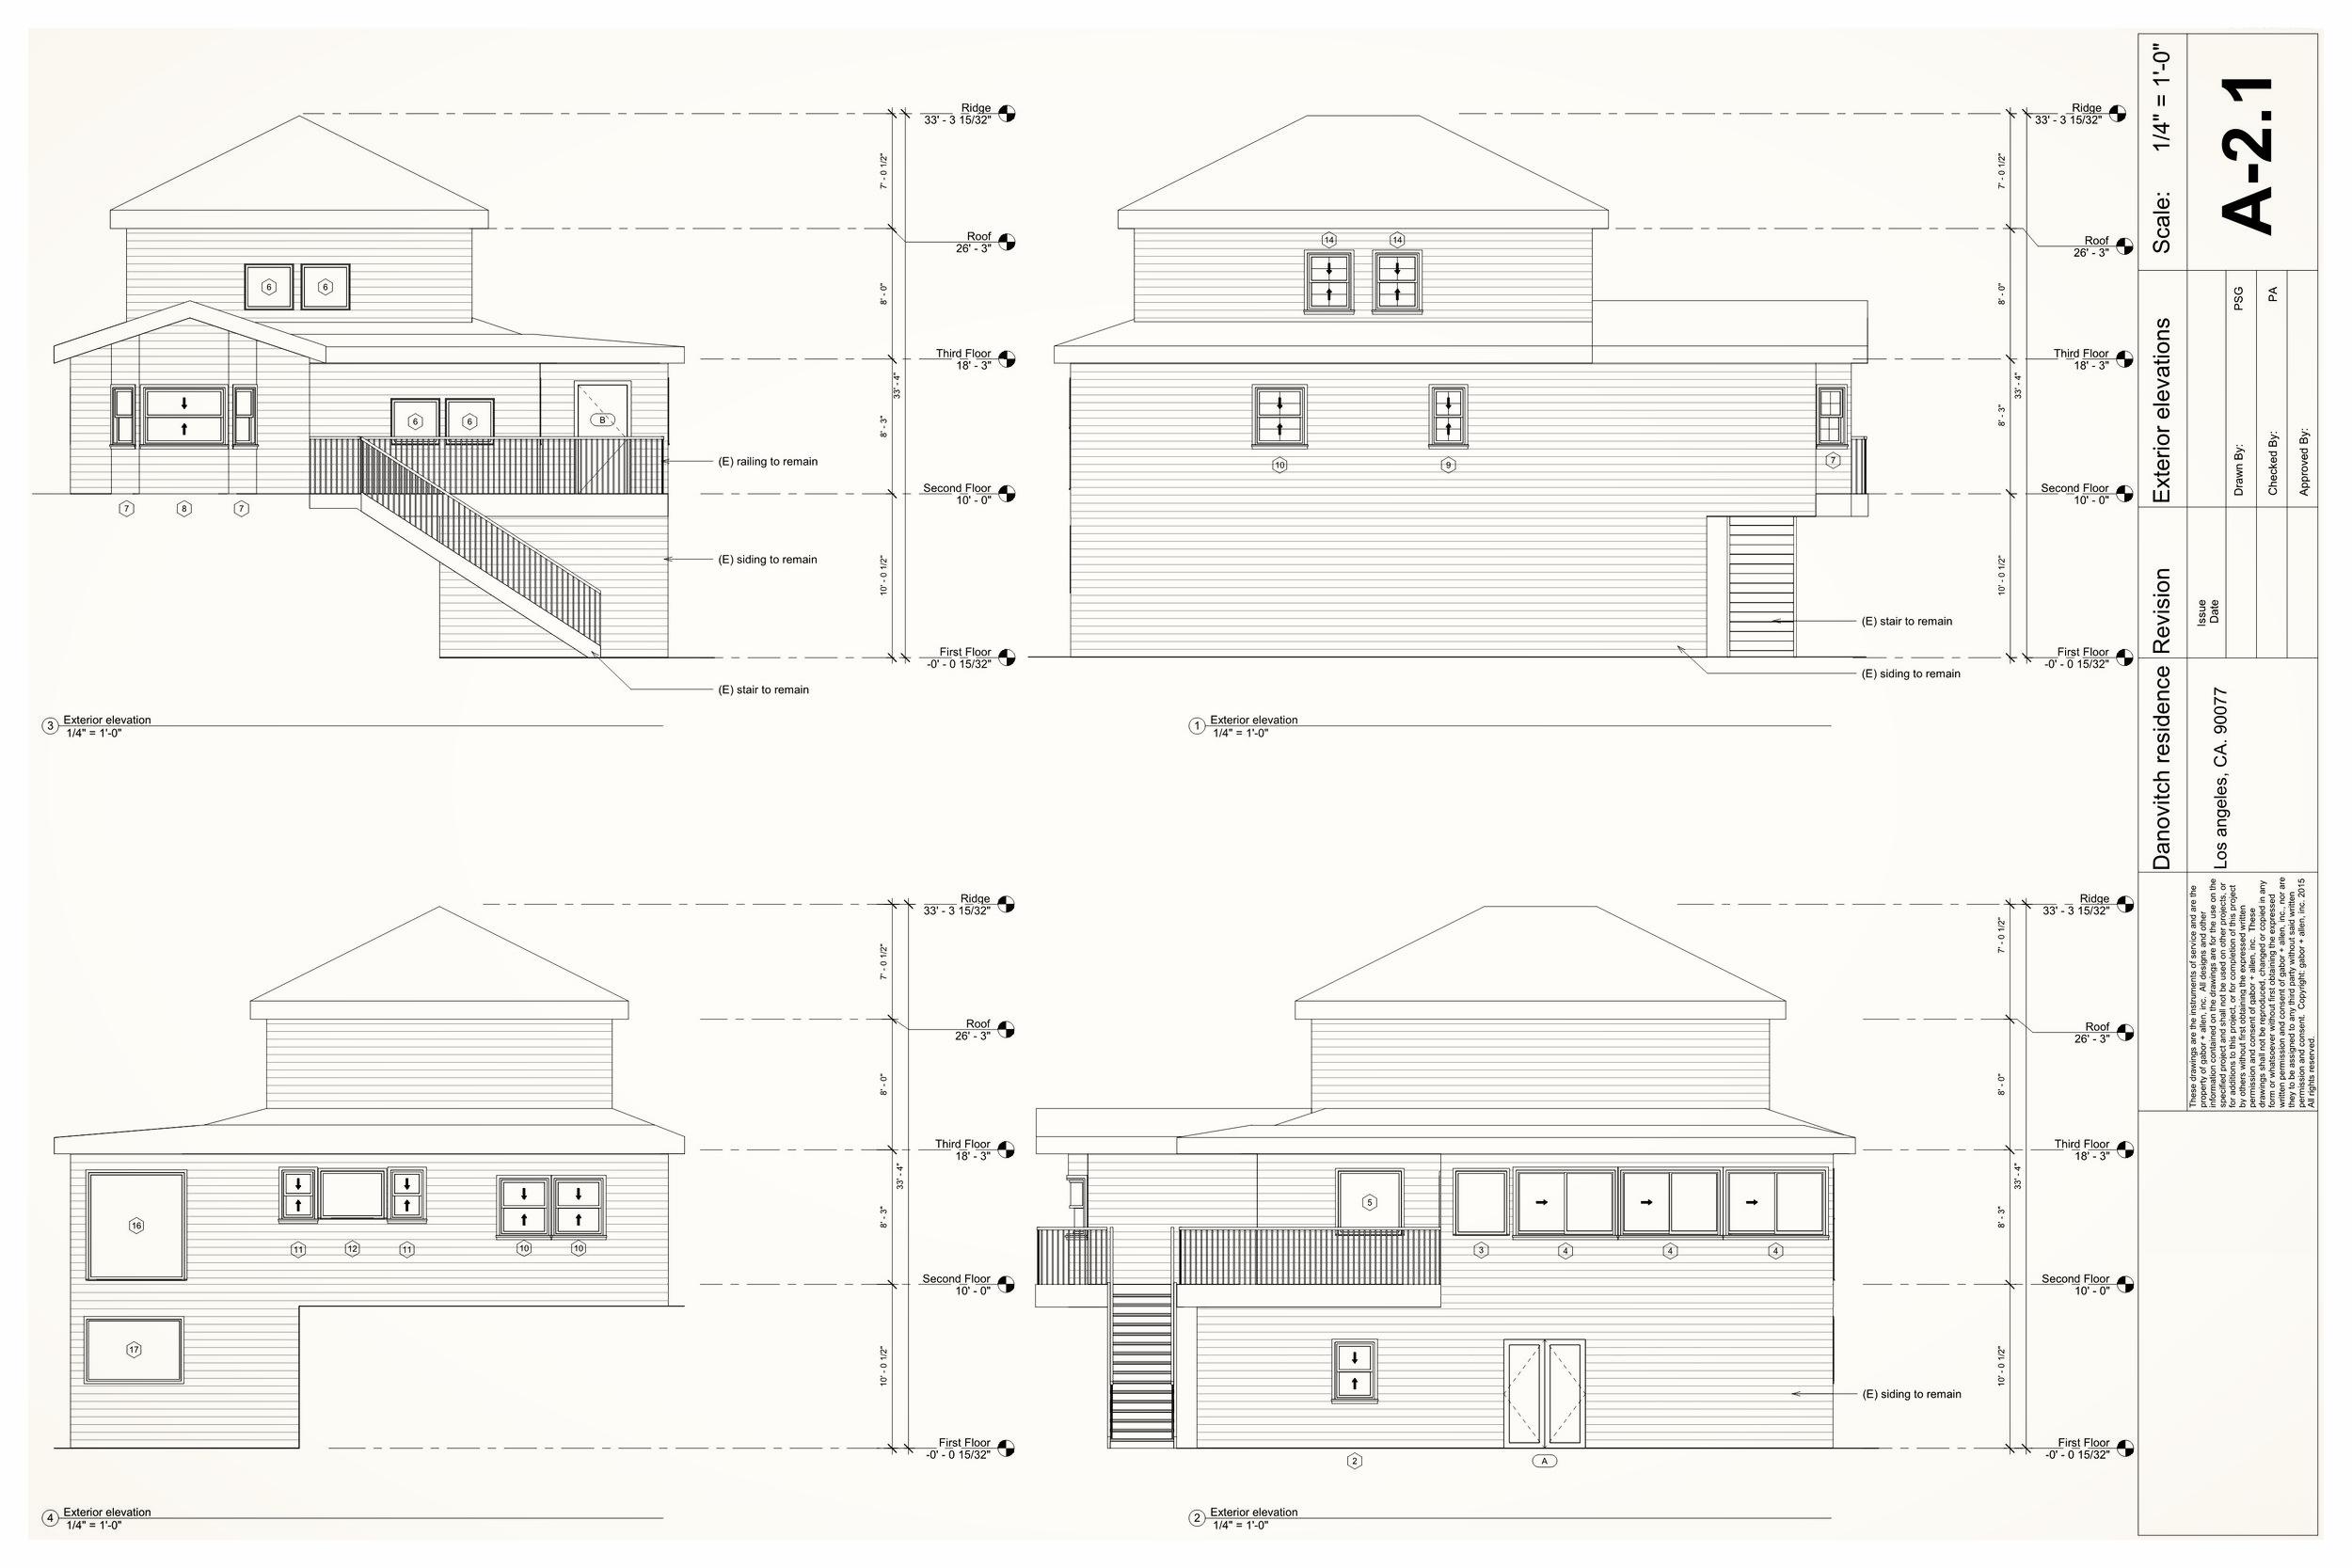 Danovitch-set-12.10.18 Page 004.jpg